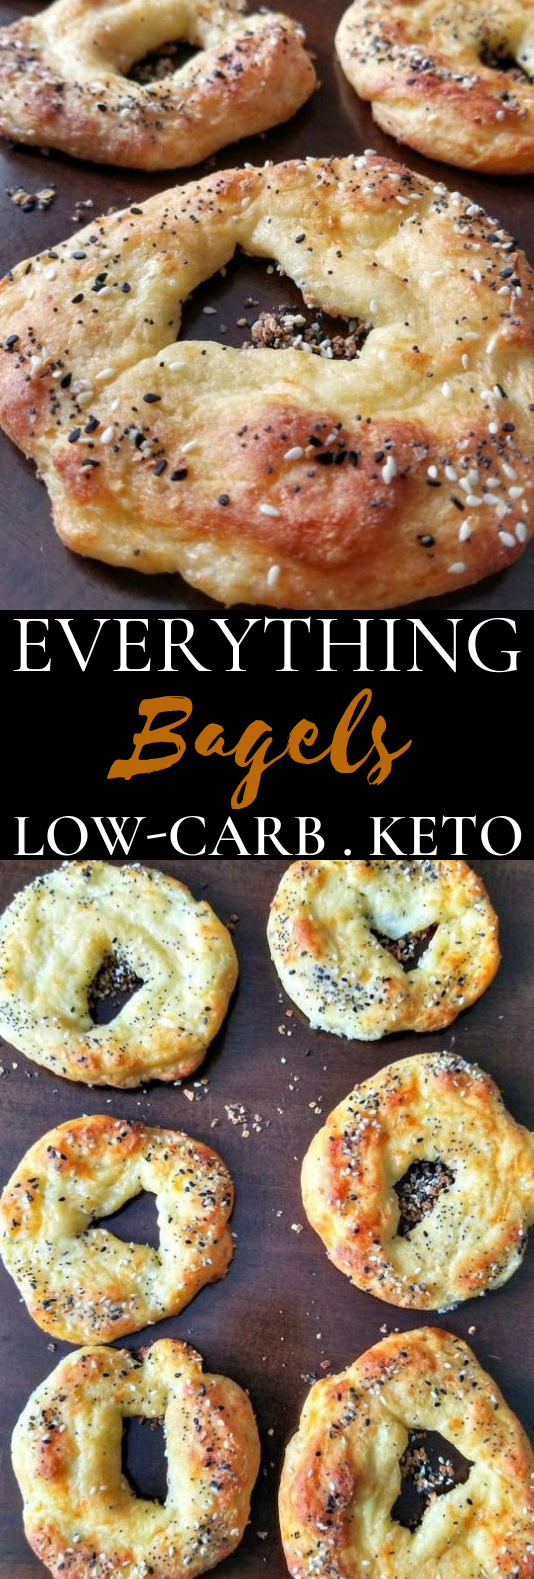 Keto Low Carb Everything Bagels #keto #breakfast